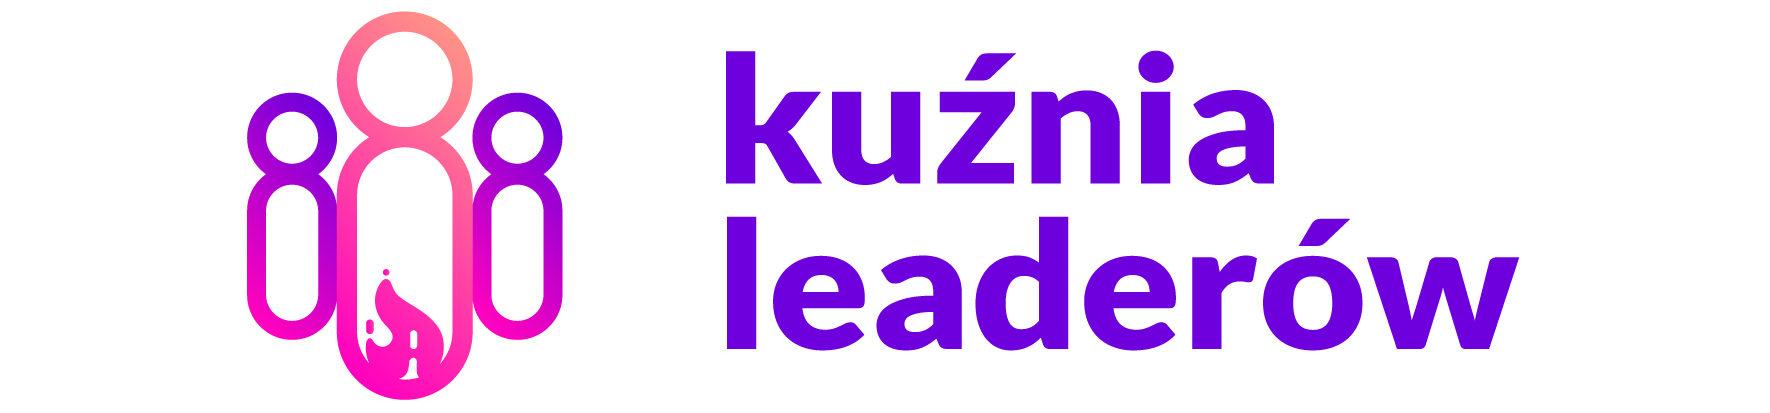 kuznia leaderow